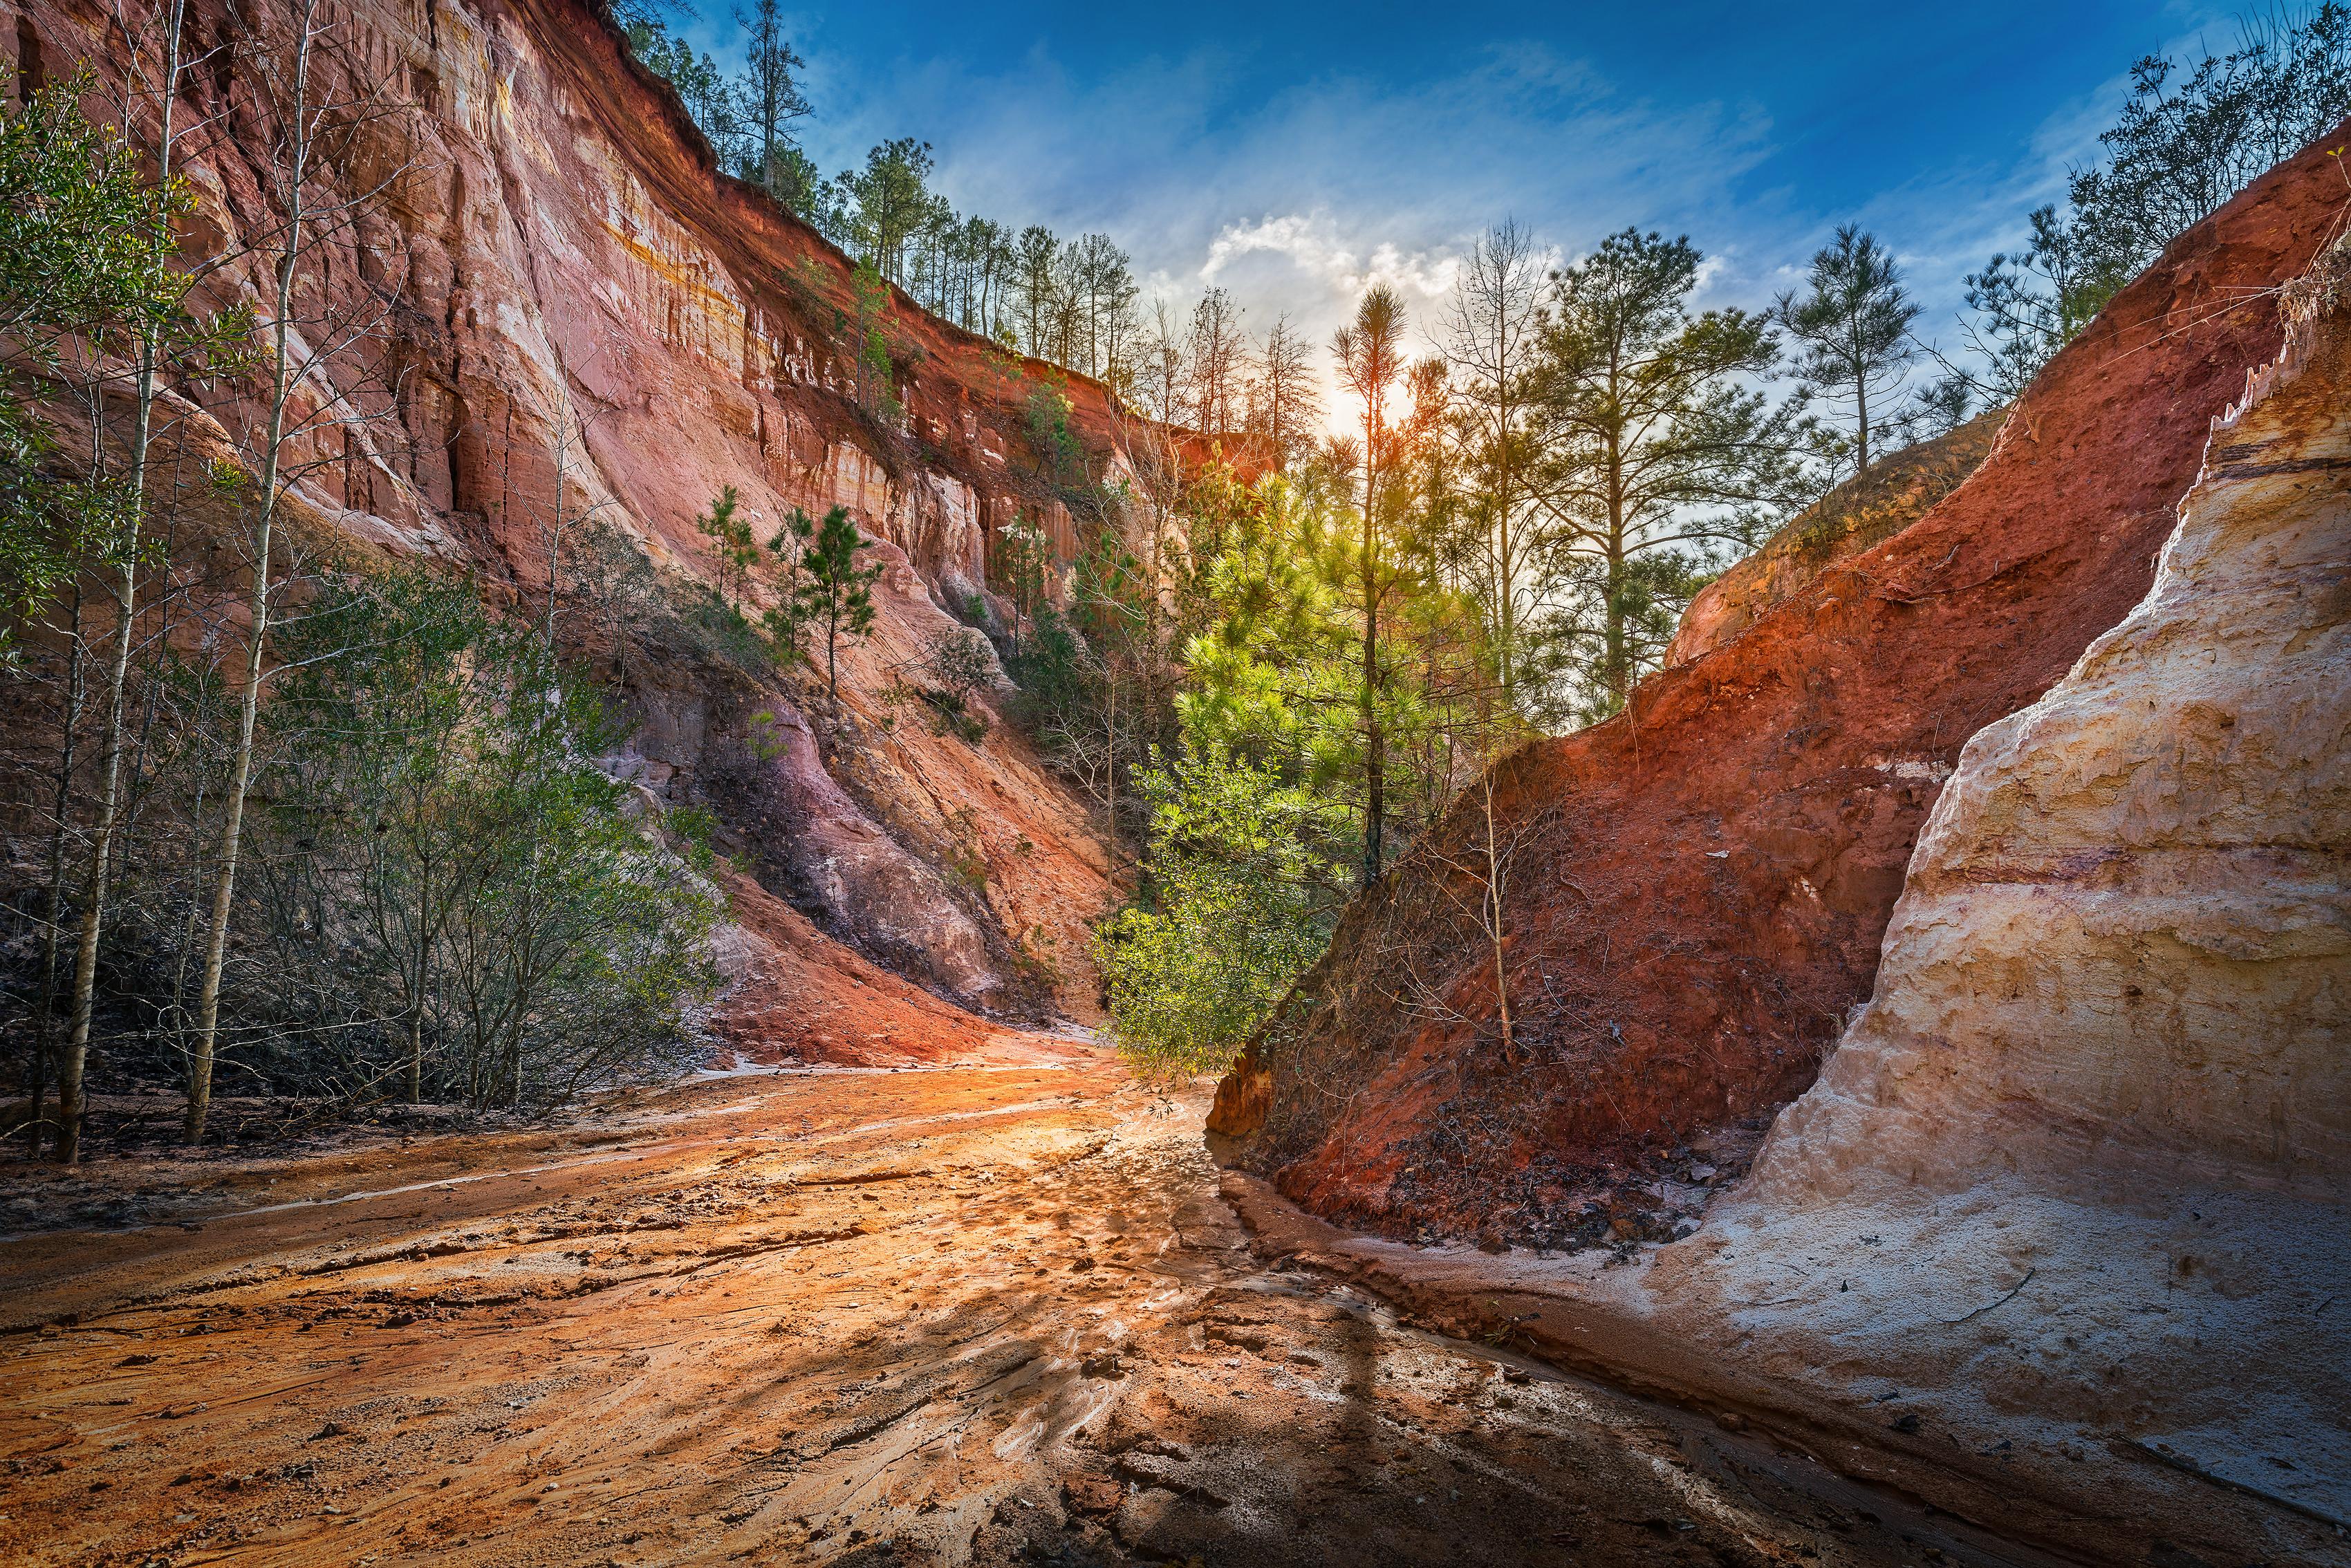 обои Государственный парк, Каньон, Грузия, закат картинки фото